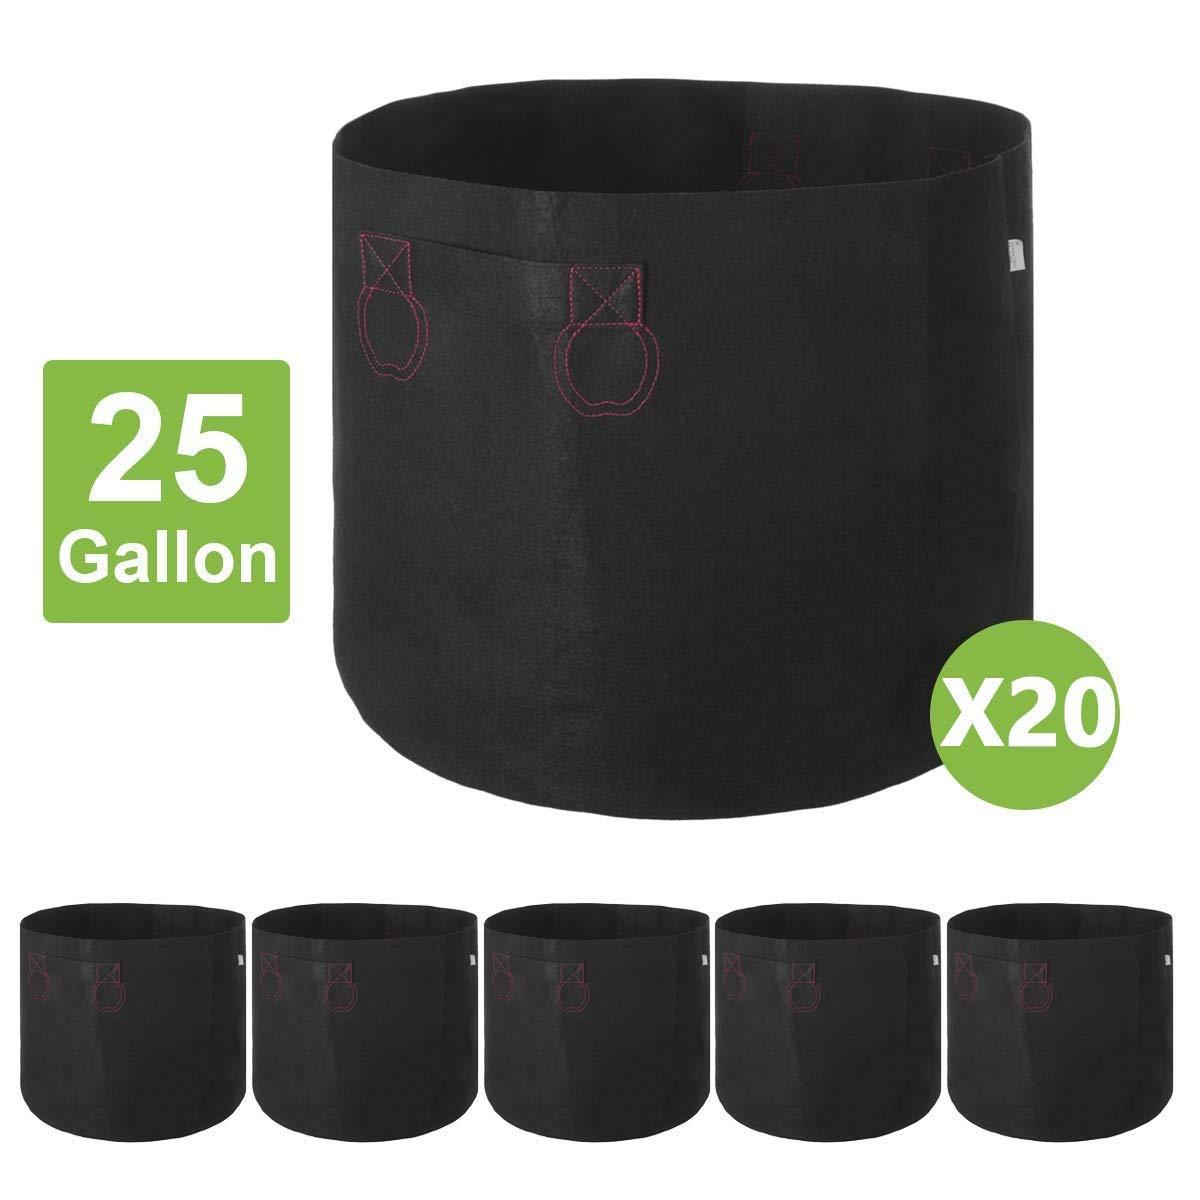 IDIGAO 20-Pack 25 Gallon Grow Bags 25 Gallon Fabric Pot for Plants Breathable Potato Planting Bag Planter with Handles